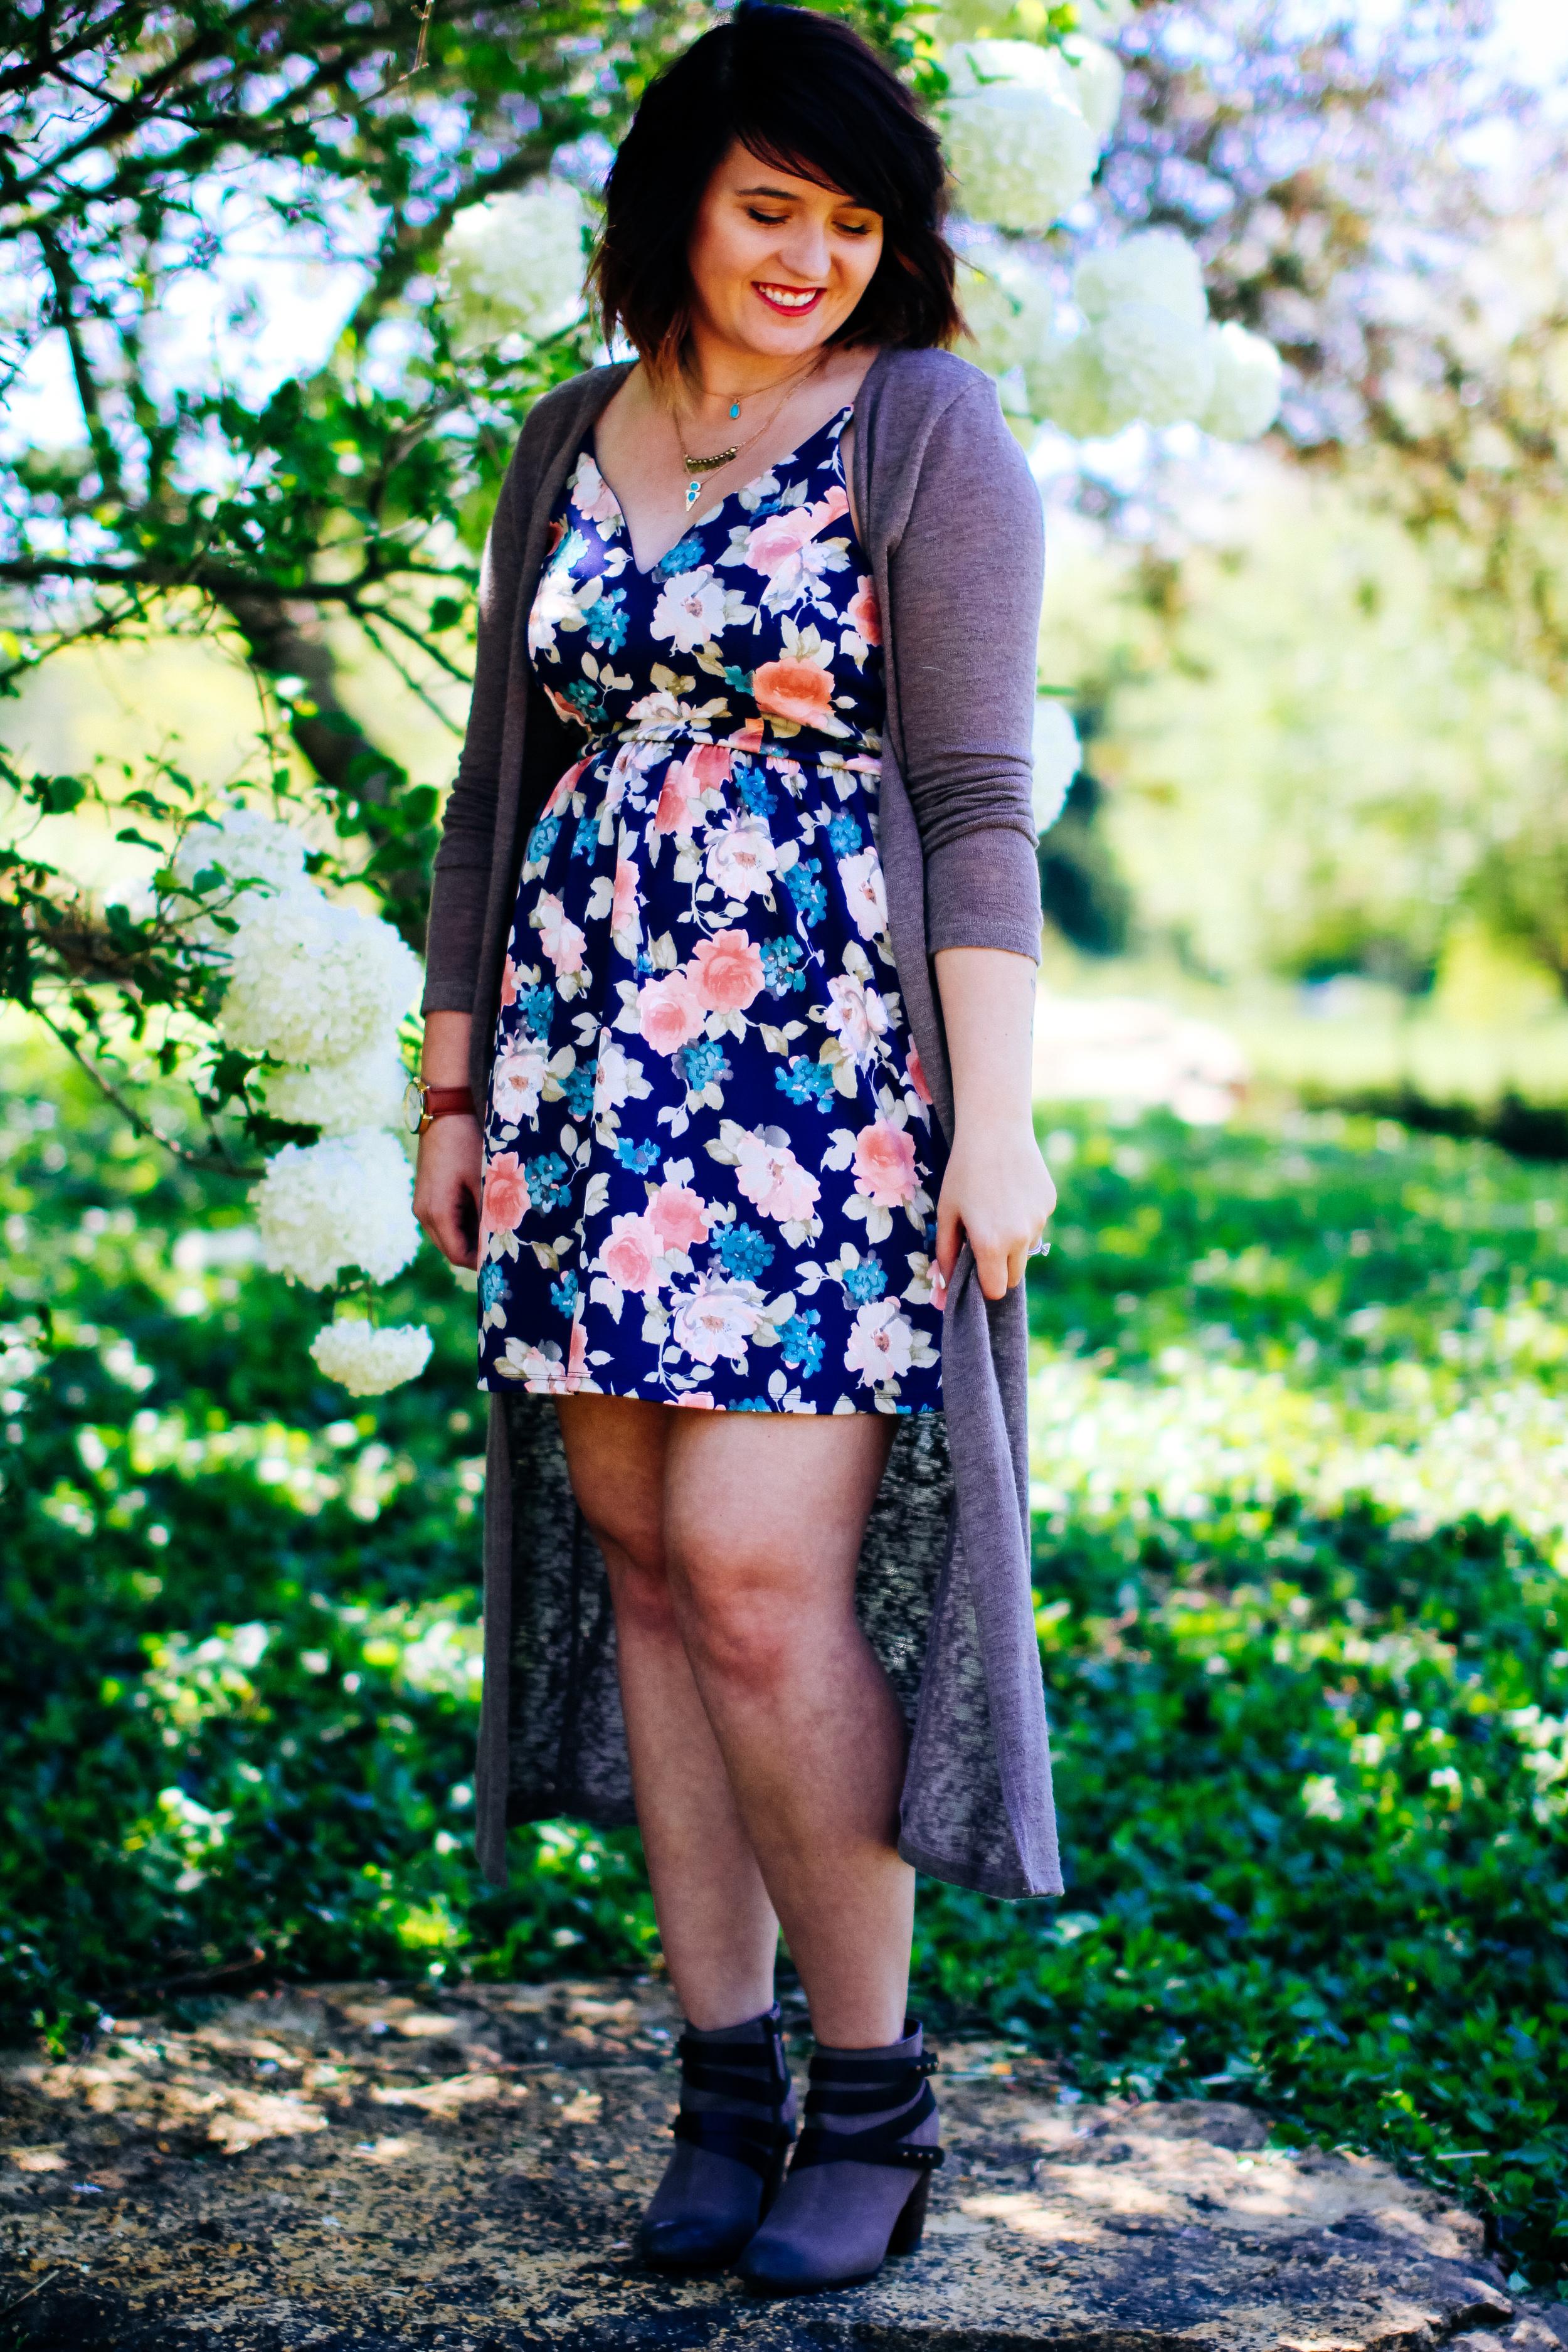 Flirty in Floral Modcloth Dress via www.chelceytate.com